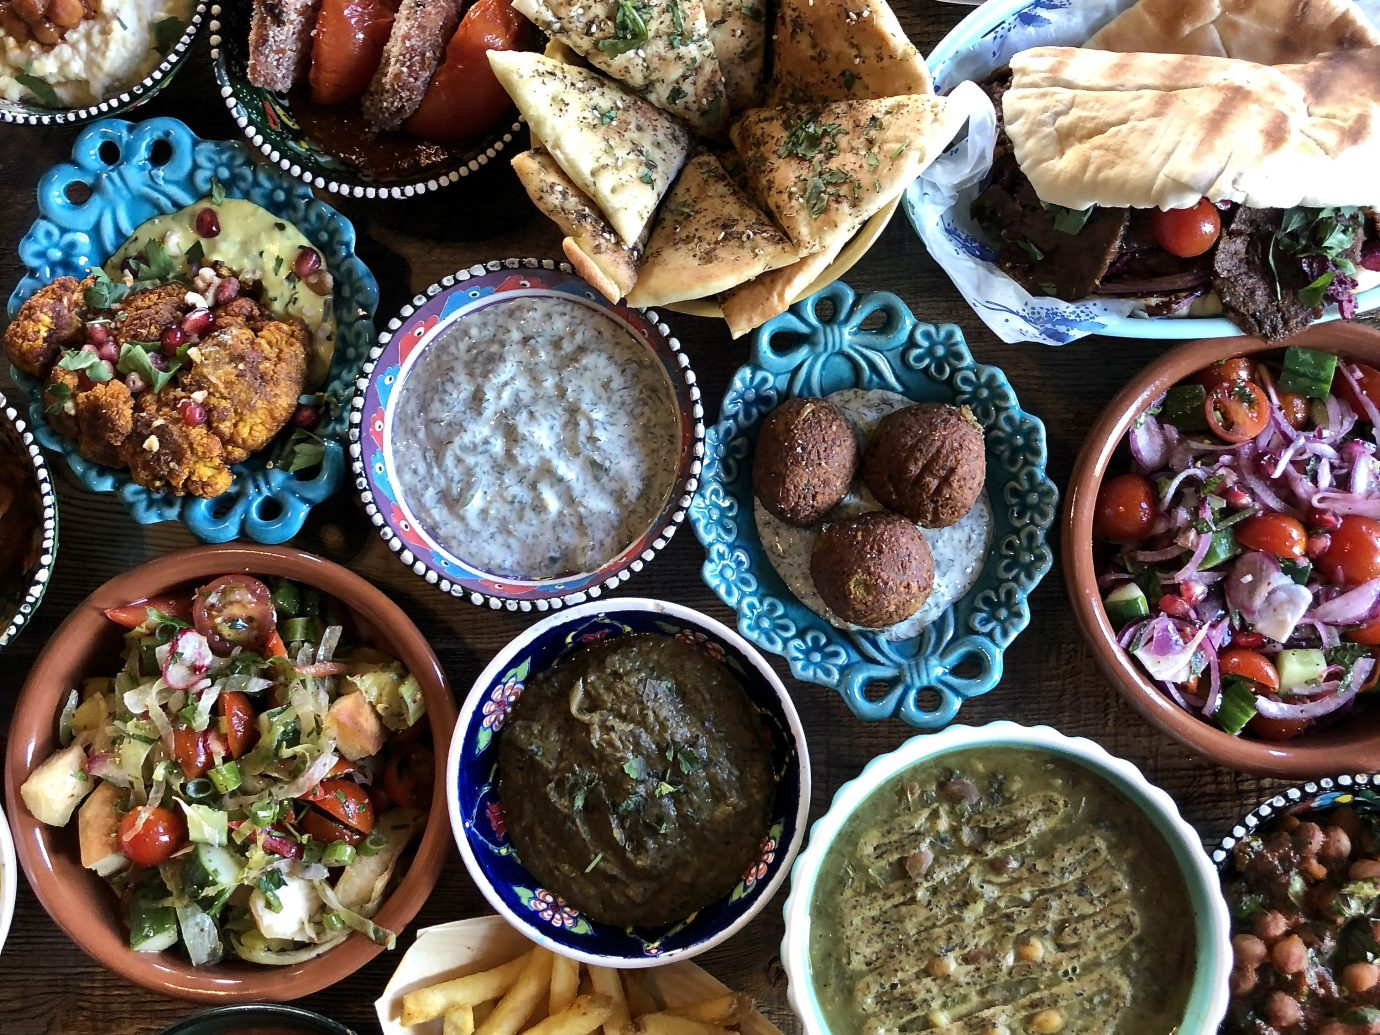 numerous delicious vegan dishes from Koocha Mezze Bar